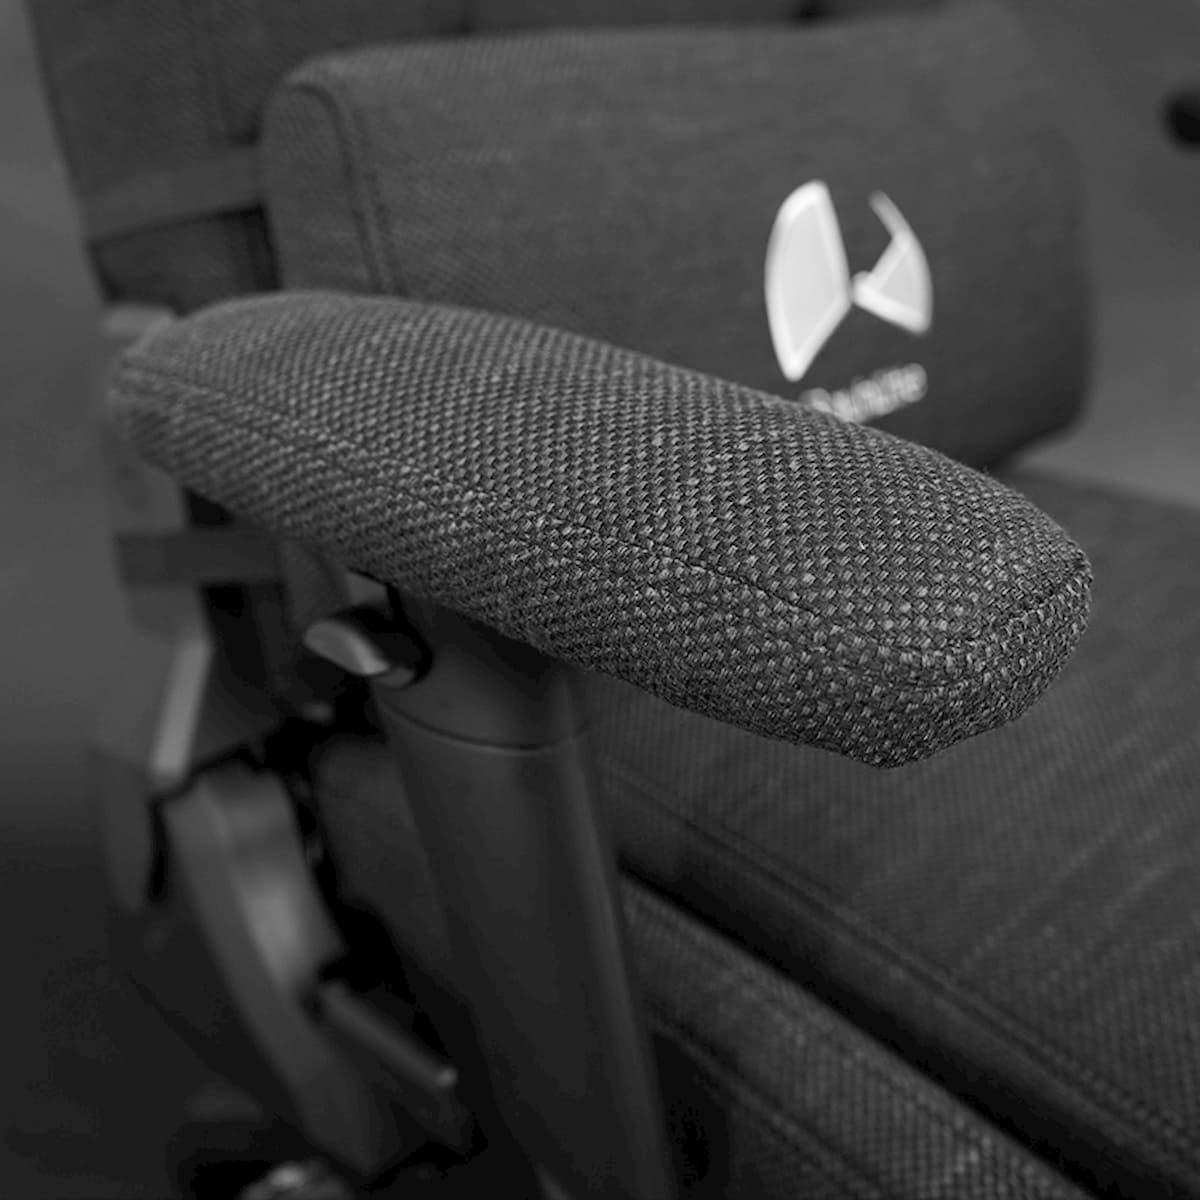 Bauhutte Gaming Floor Sofa Chair GX-350